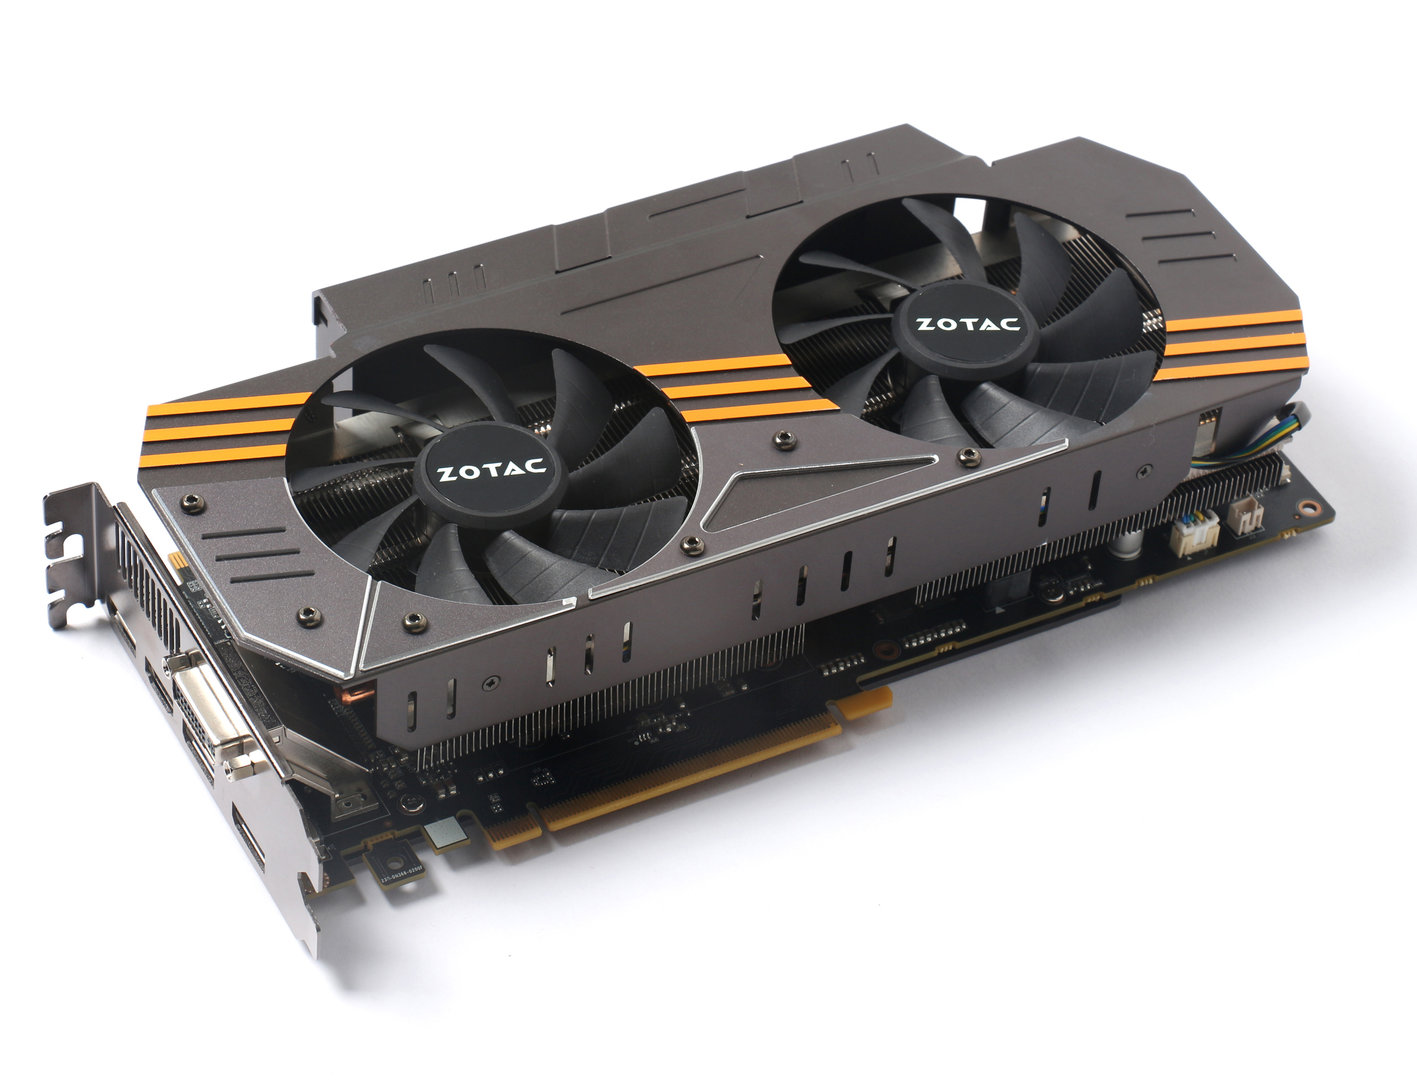 Zotac GeForce GTX 980 AMP! Omega